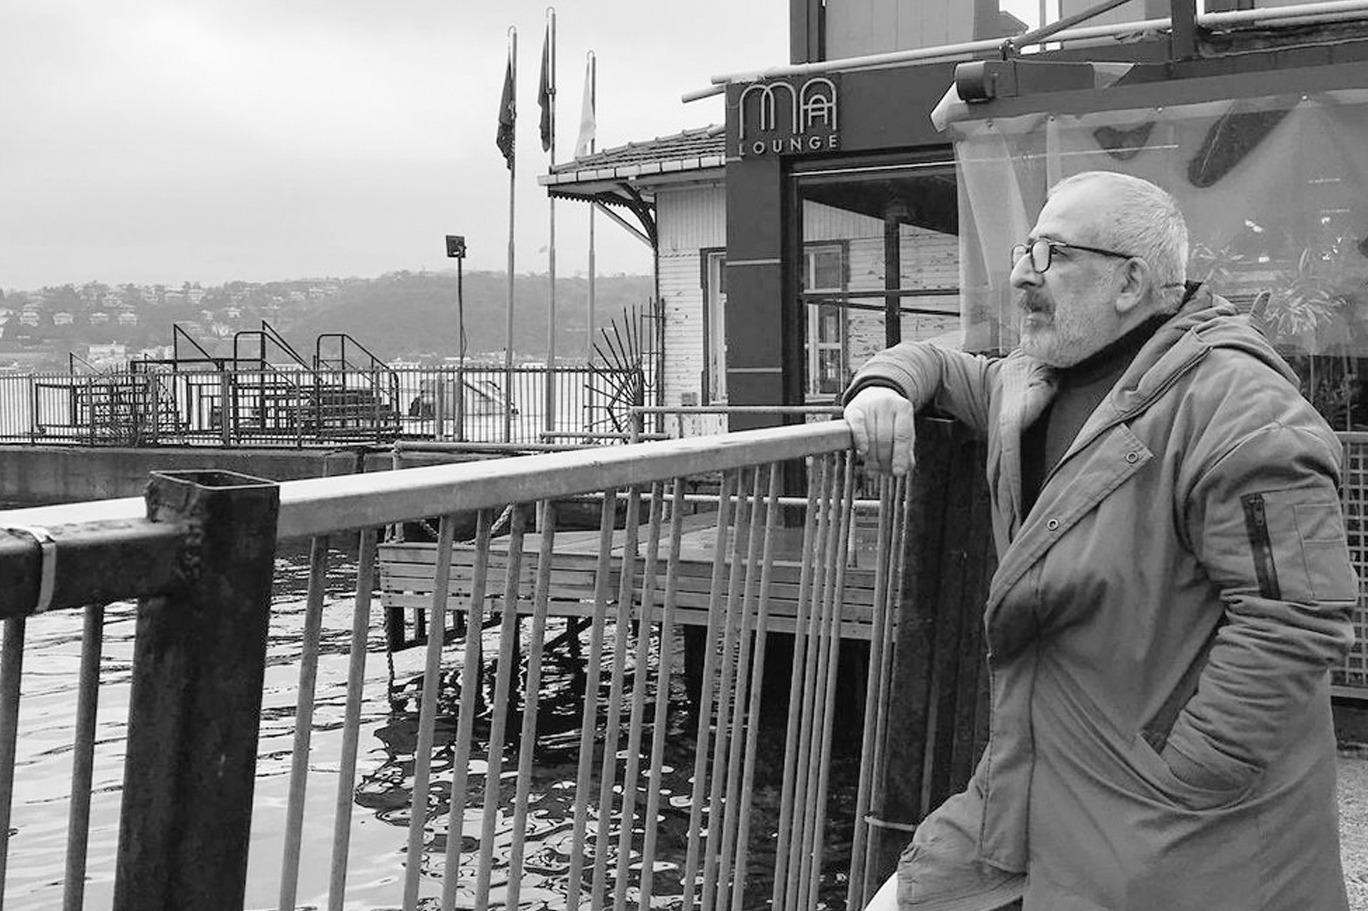 Gazeteci Ahmet Kekeç vefat etti | Independent Türkçe